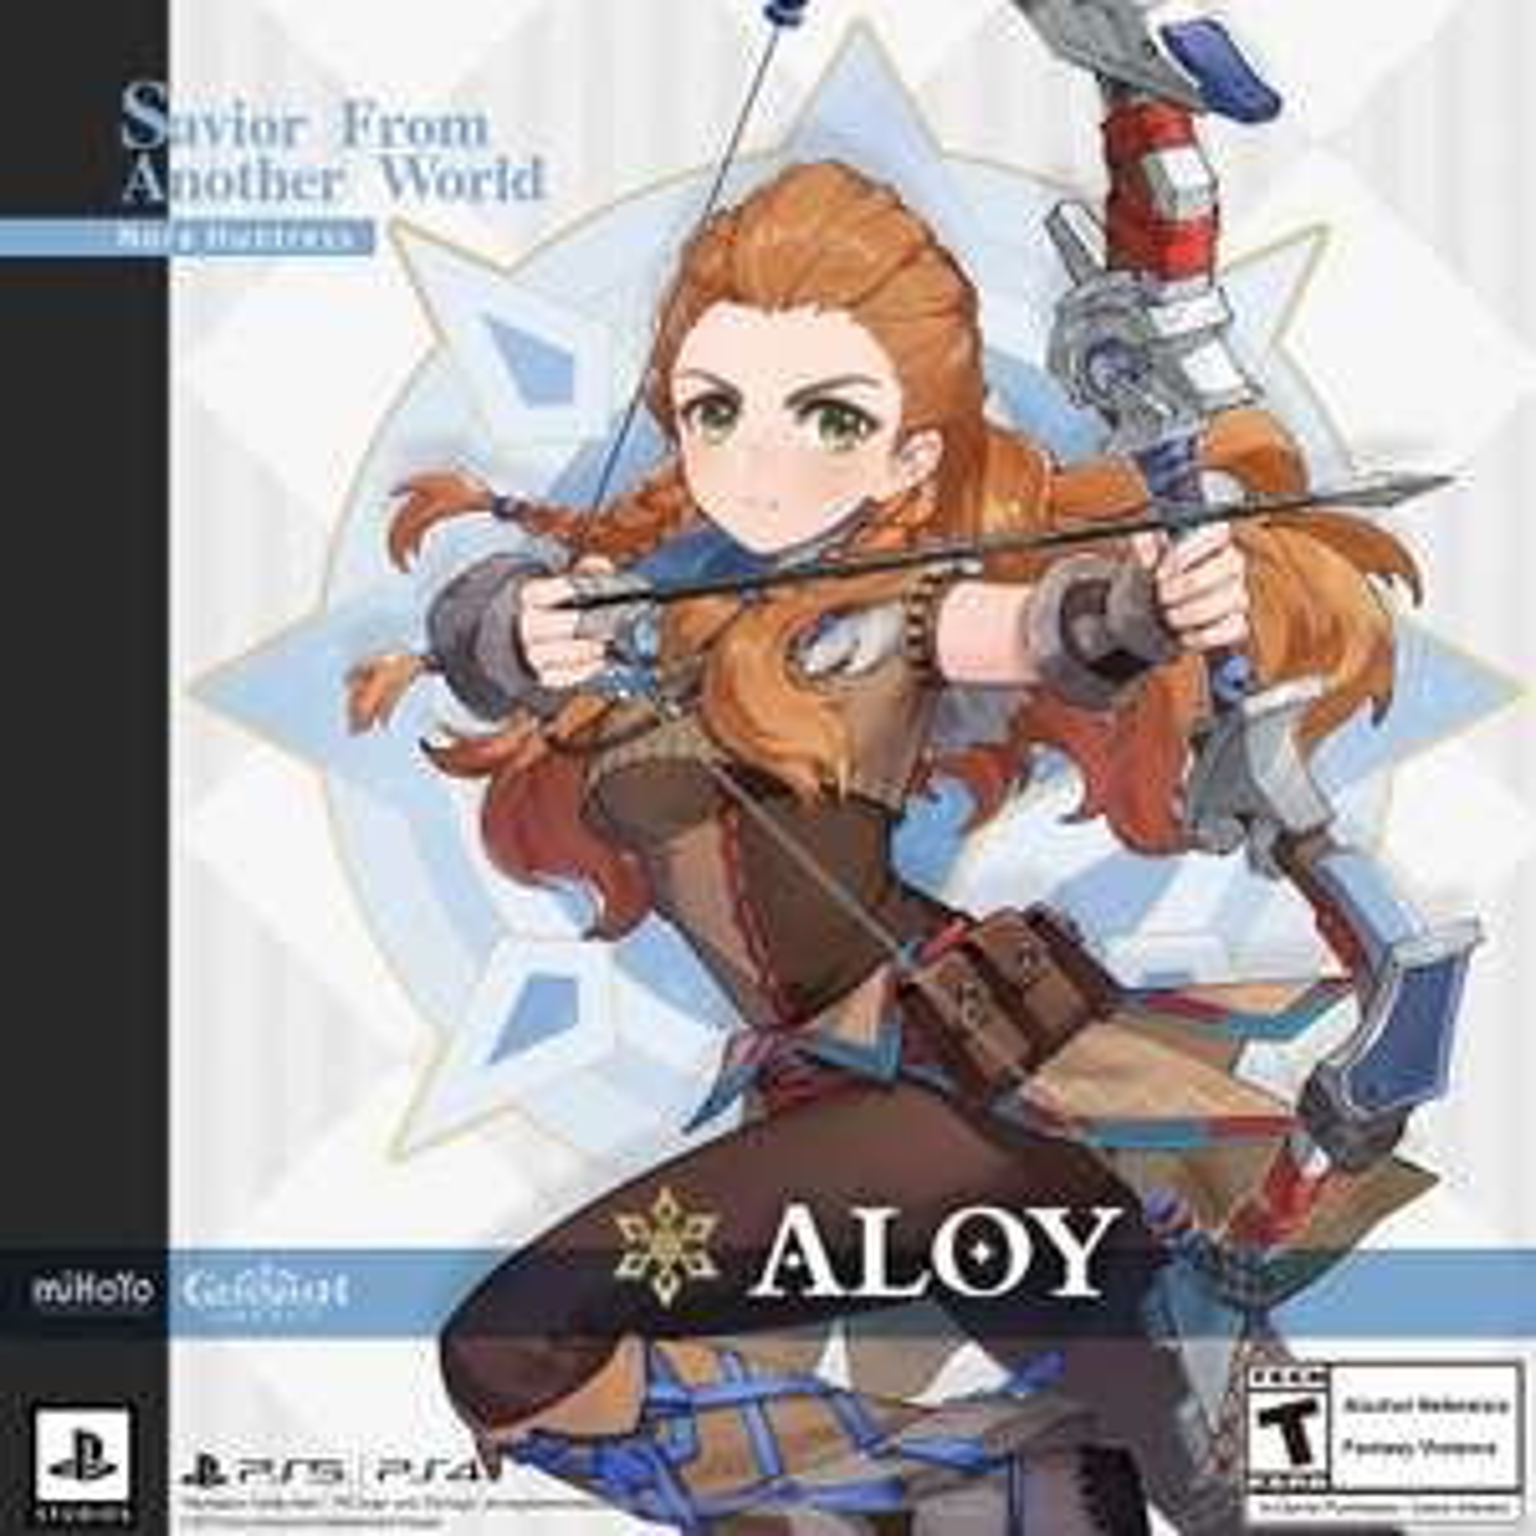 Genshin Impact - Kostenloser 5 Sterne Charakter Aloy aus Horizon Zero Dawn